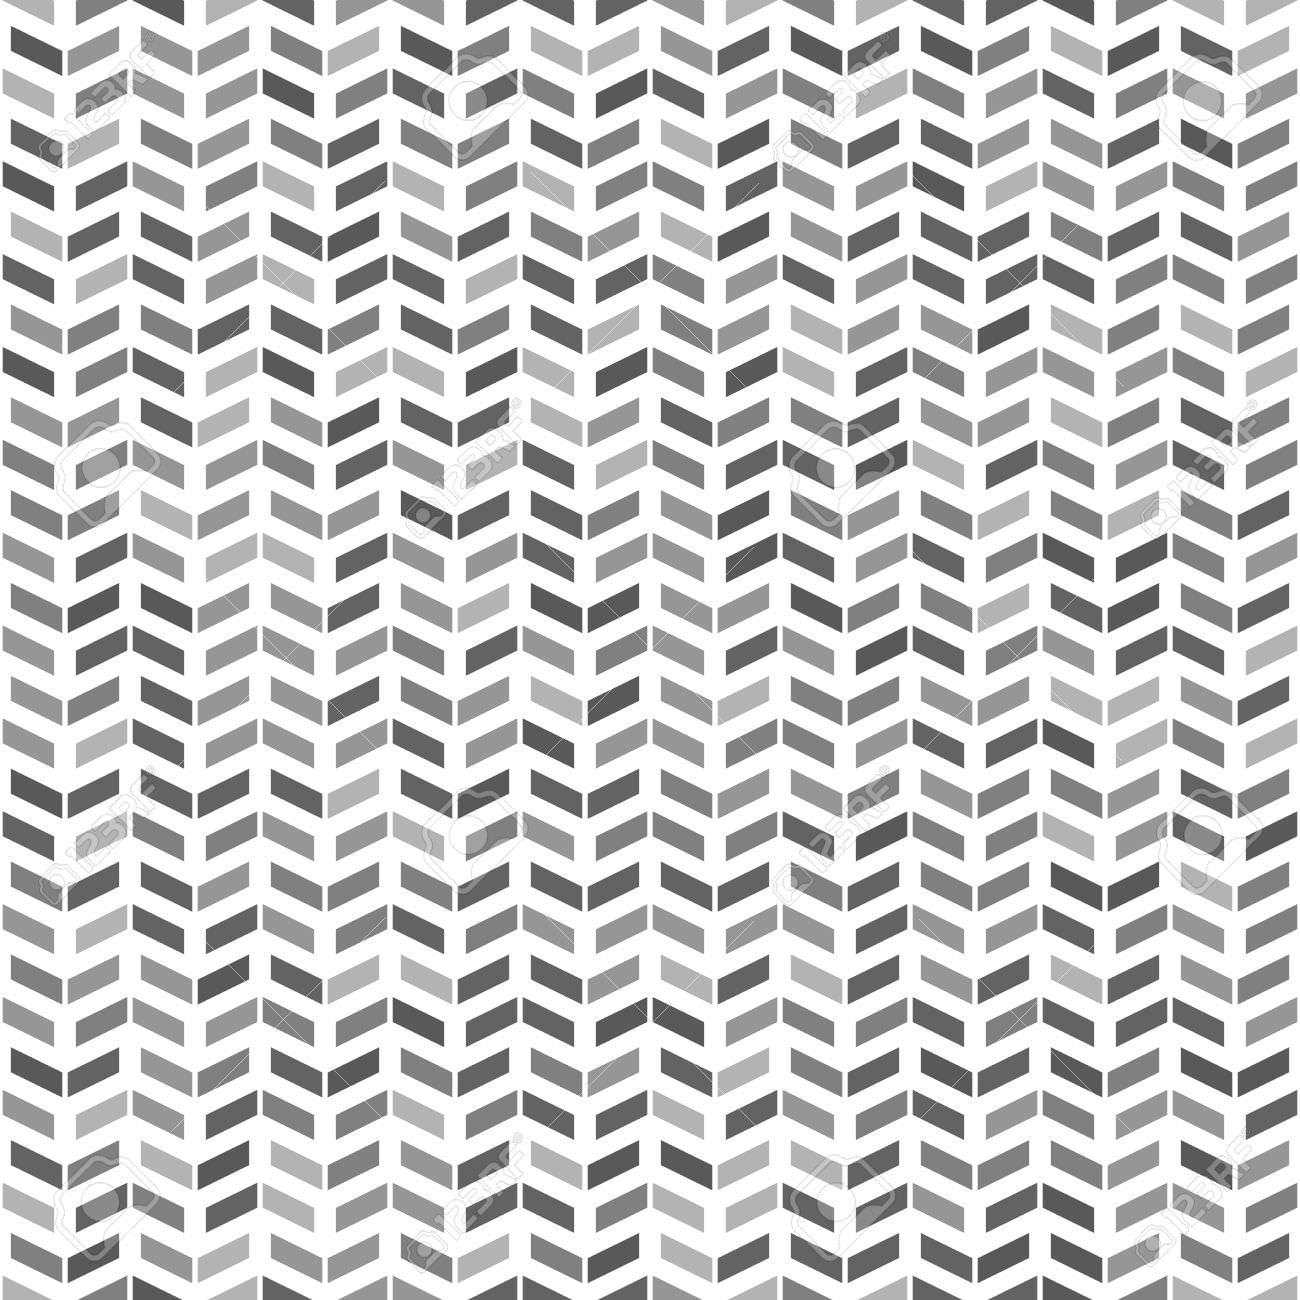 Geometric Grey and White Background